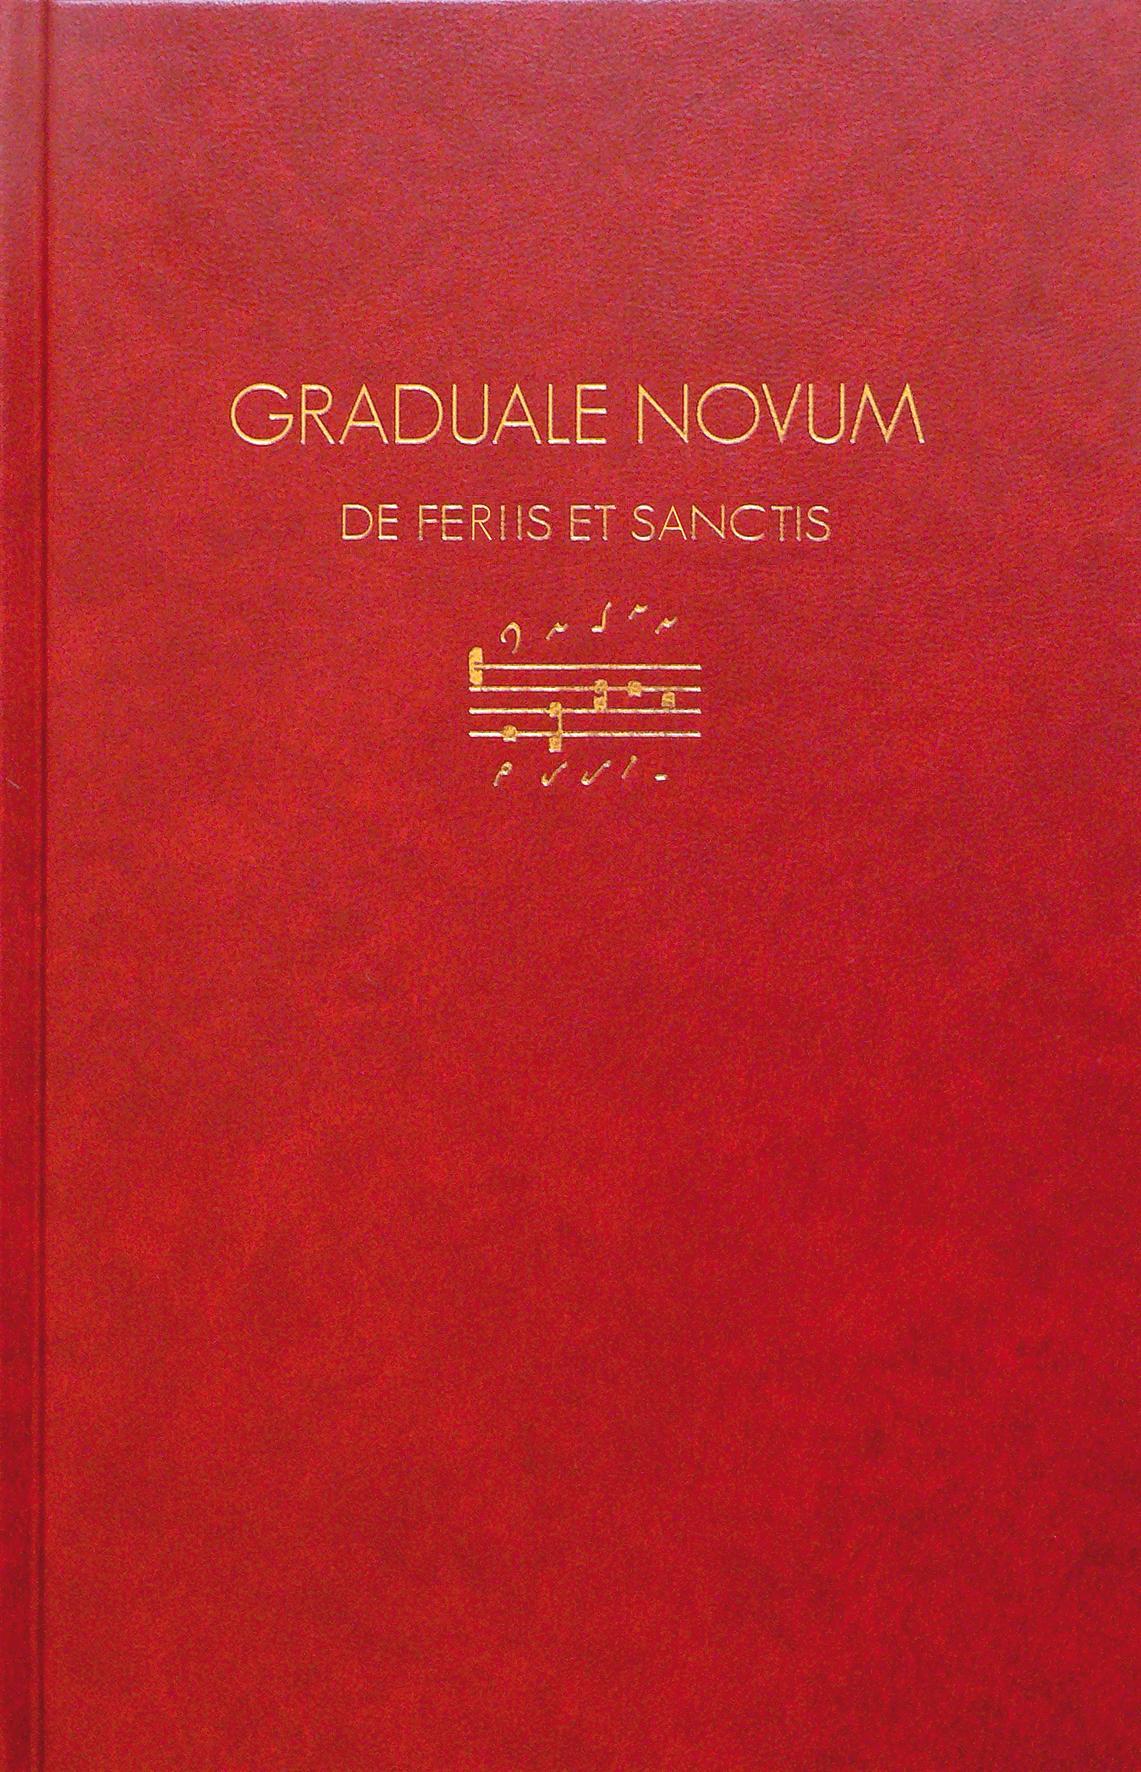 Graduale Novum  Editio magis critica iuxta SC 117  Tomus II: De Feriis Et Sanctis  Christian Dostal  Buch  Deutsch  2018 - Dostal, Christian